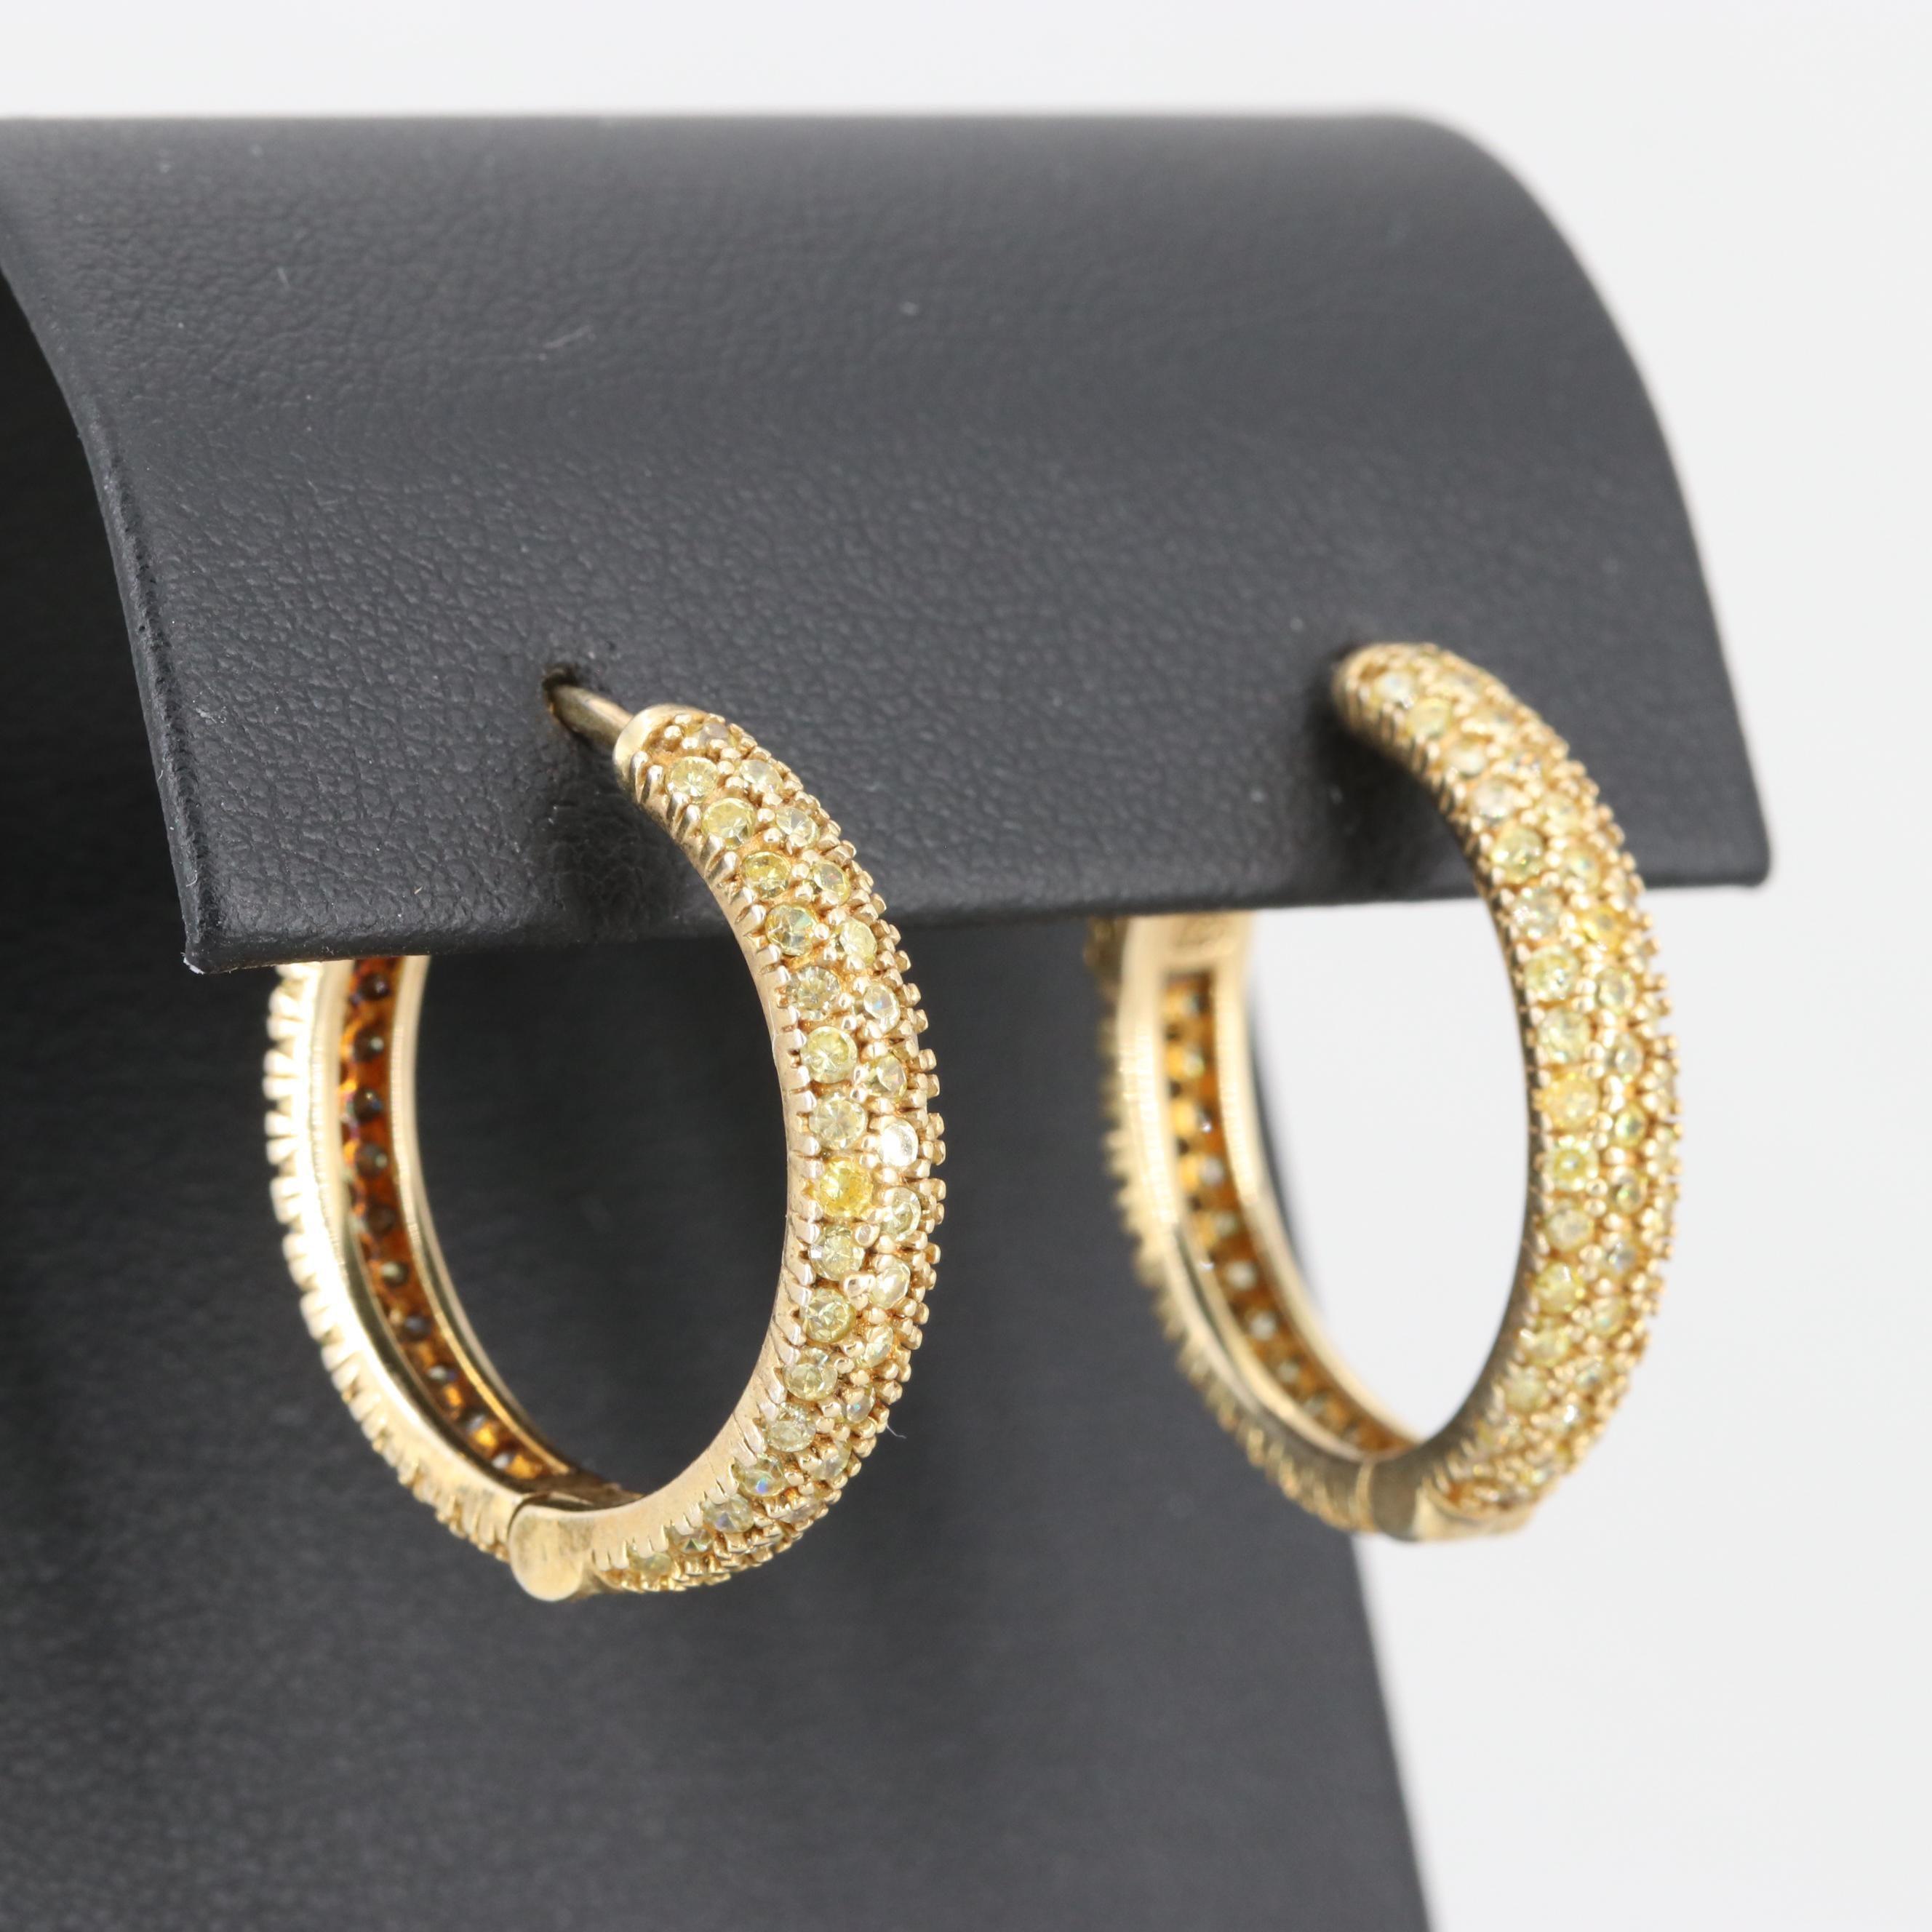 Gold Wash on Sterling Silver Cubic Zirconia Hoop Earrings